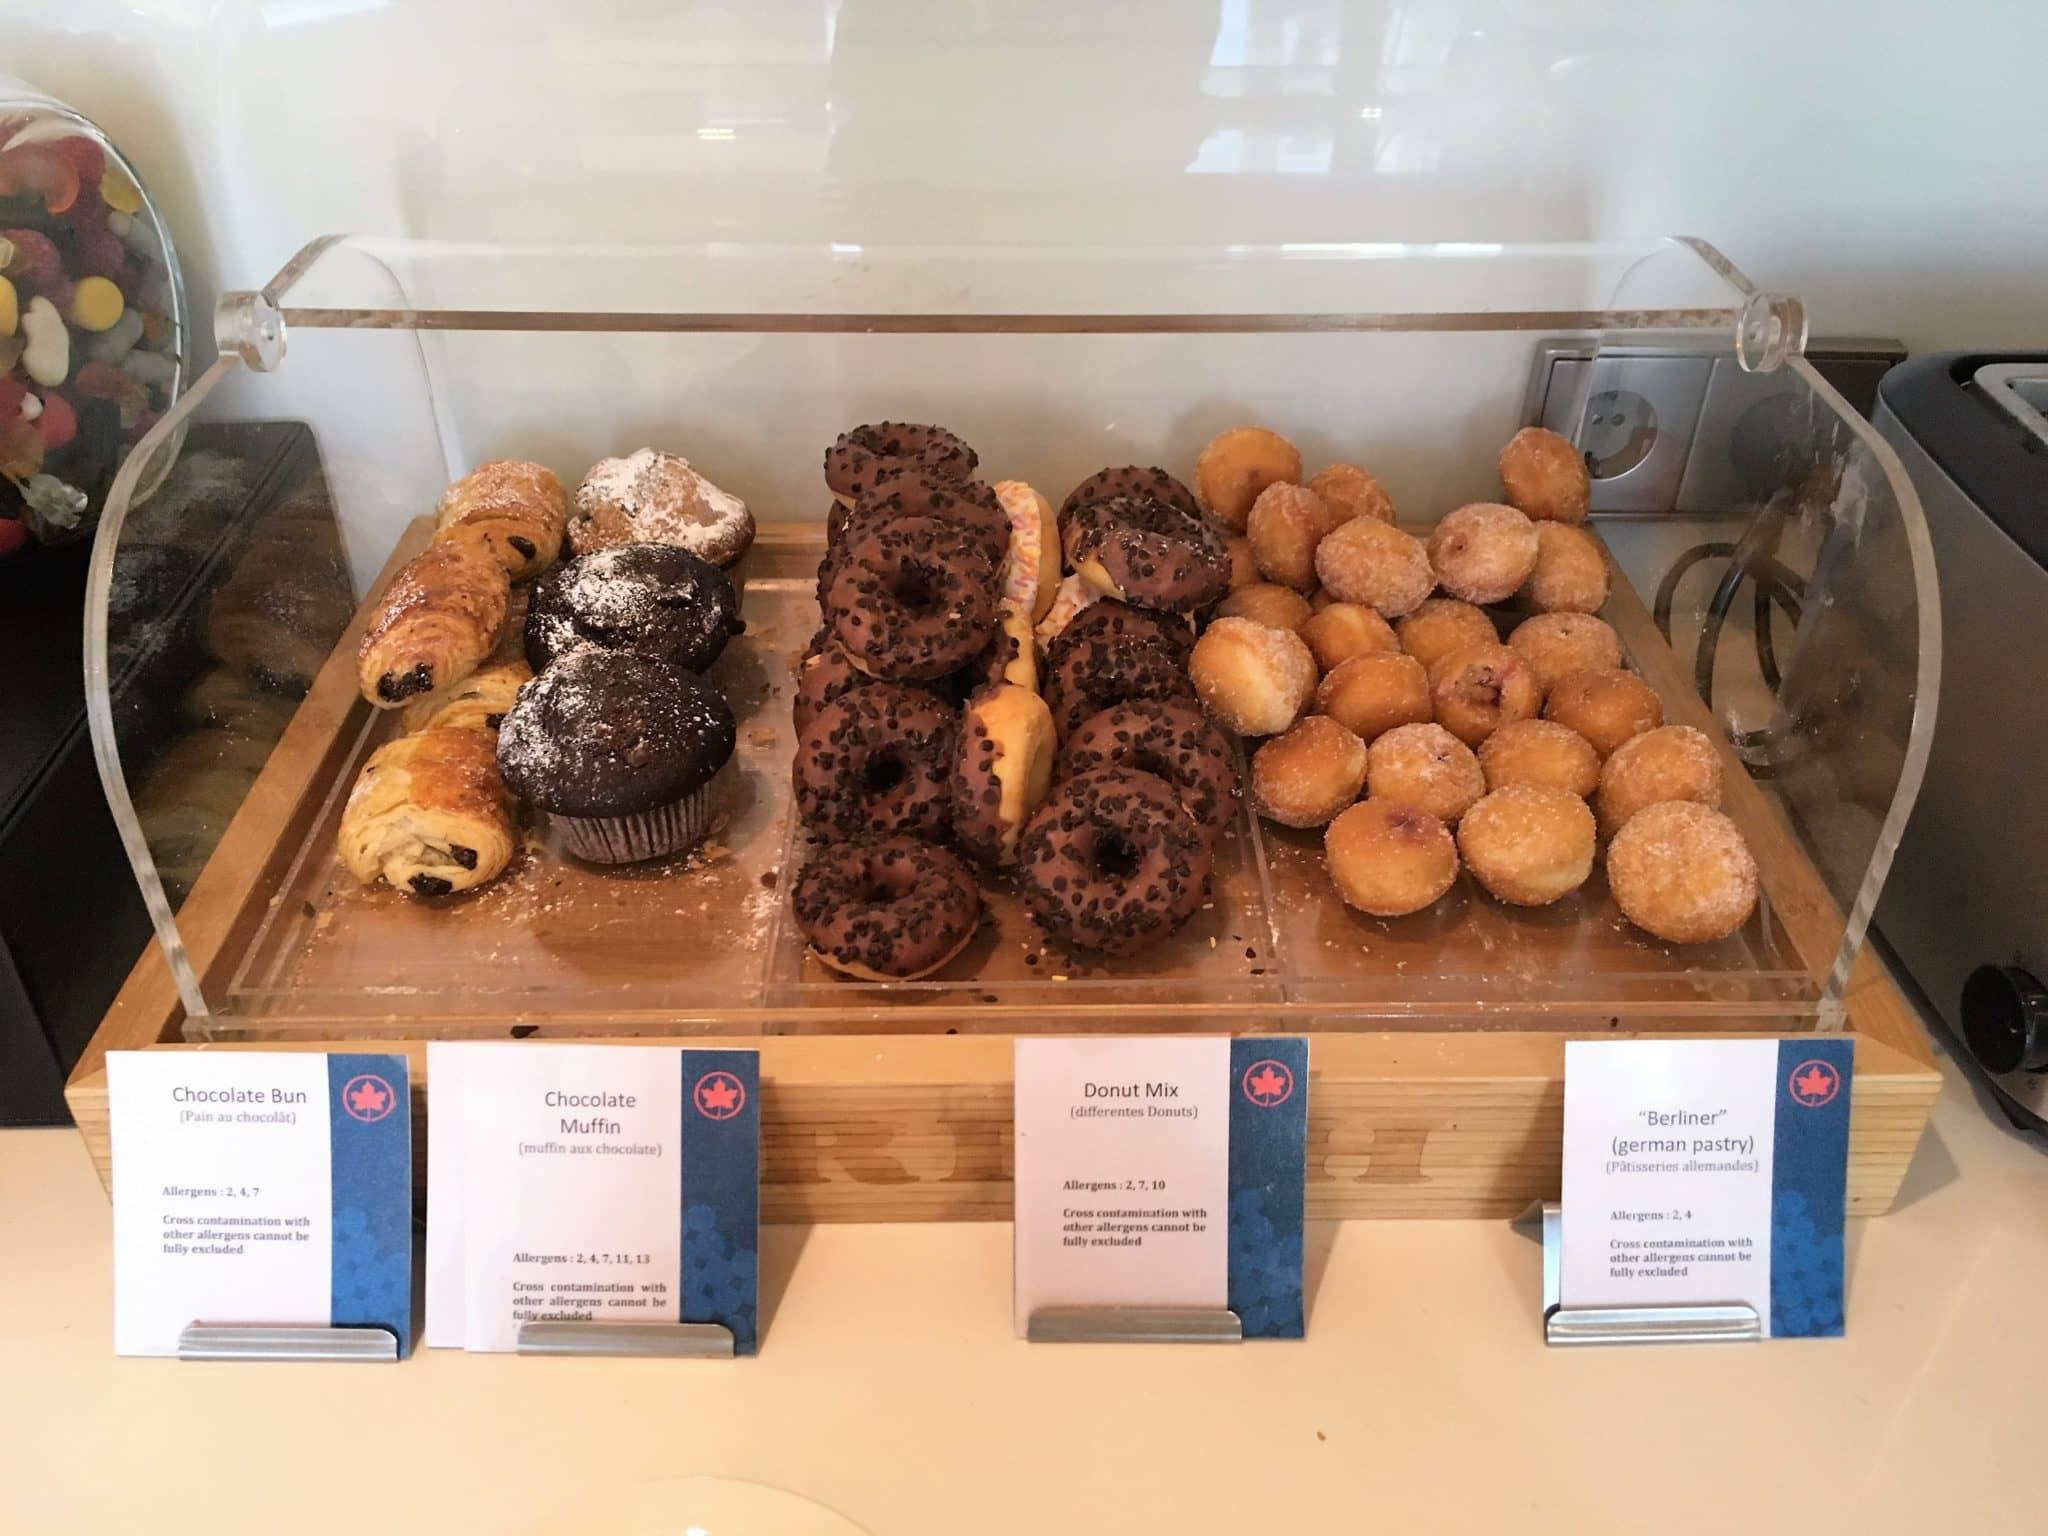 Air Canada Maple Leaf Lounge Frankfurt Donuts, Muffins, Schokocroissants